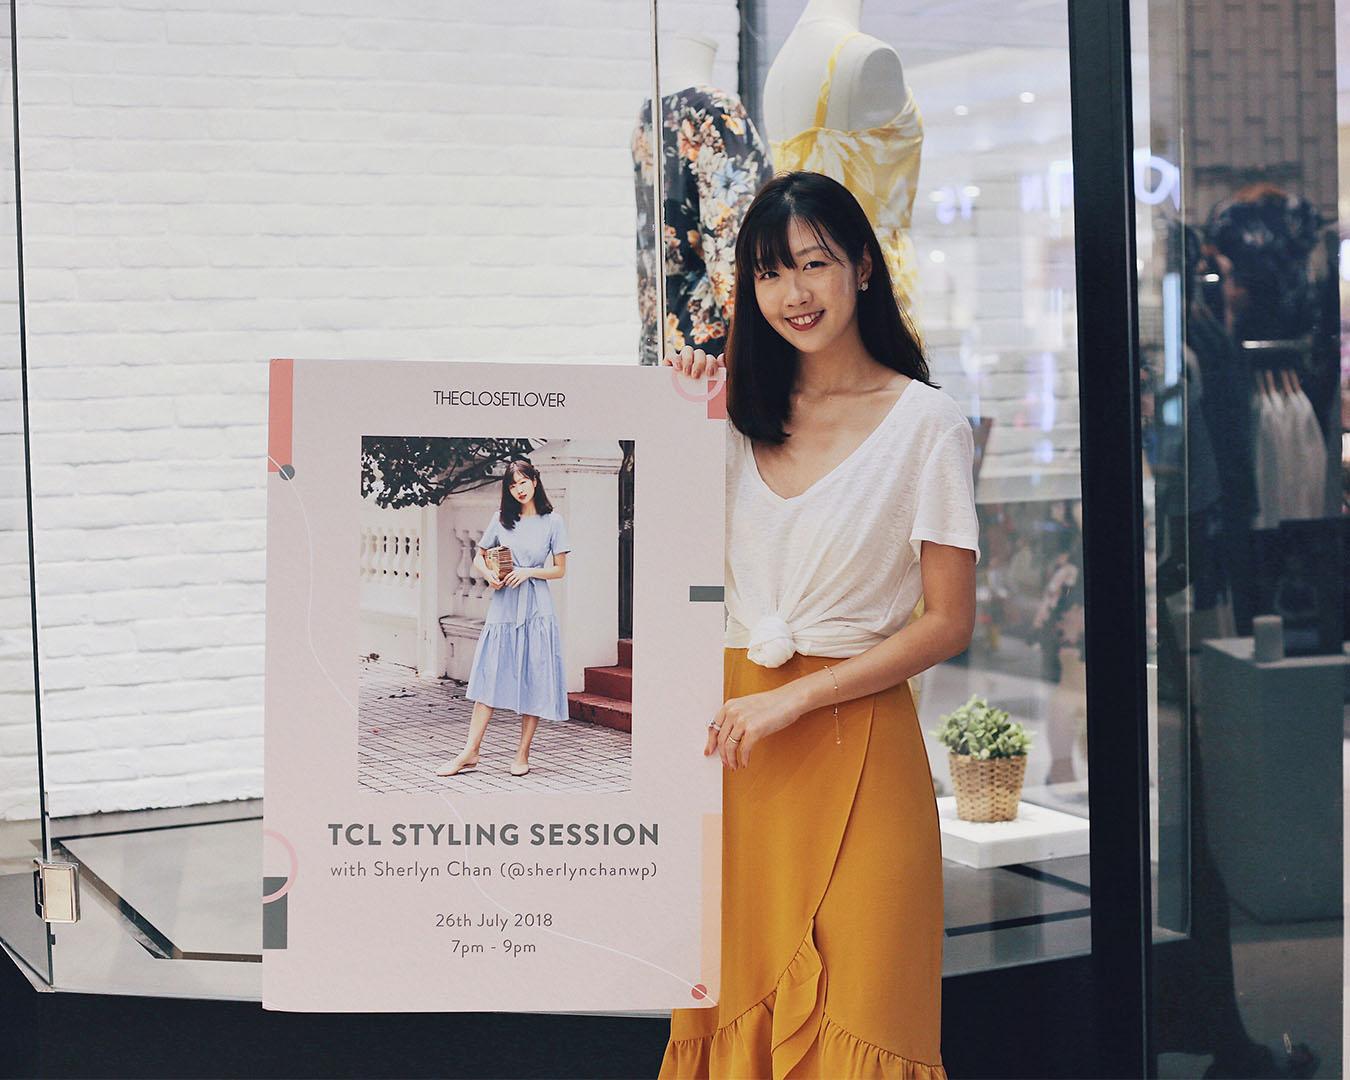 A Stylish Night with Sherlyn Chan (@sherlynchanwp)